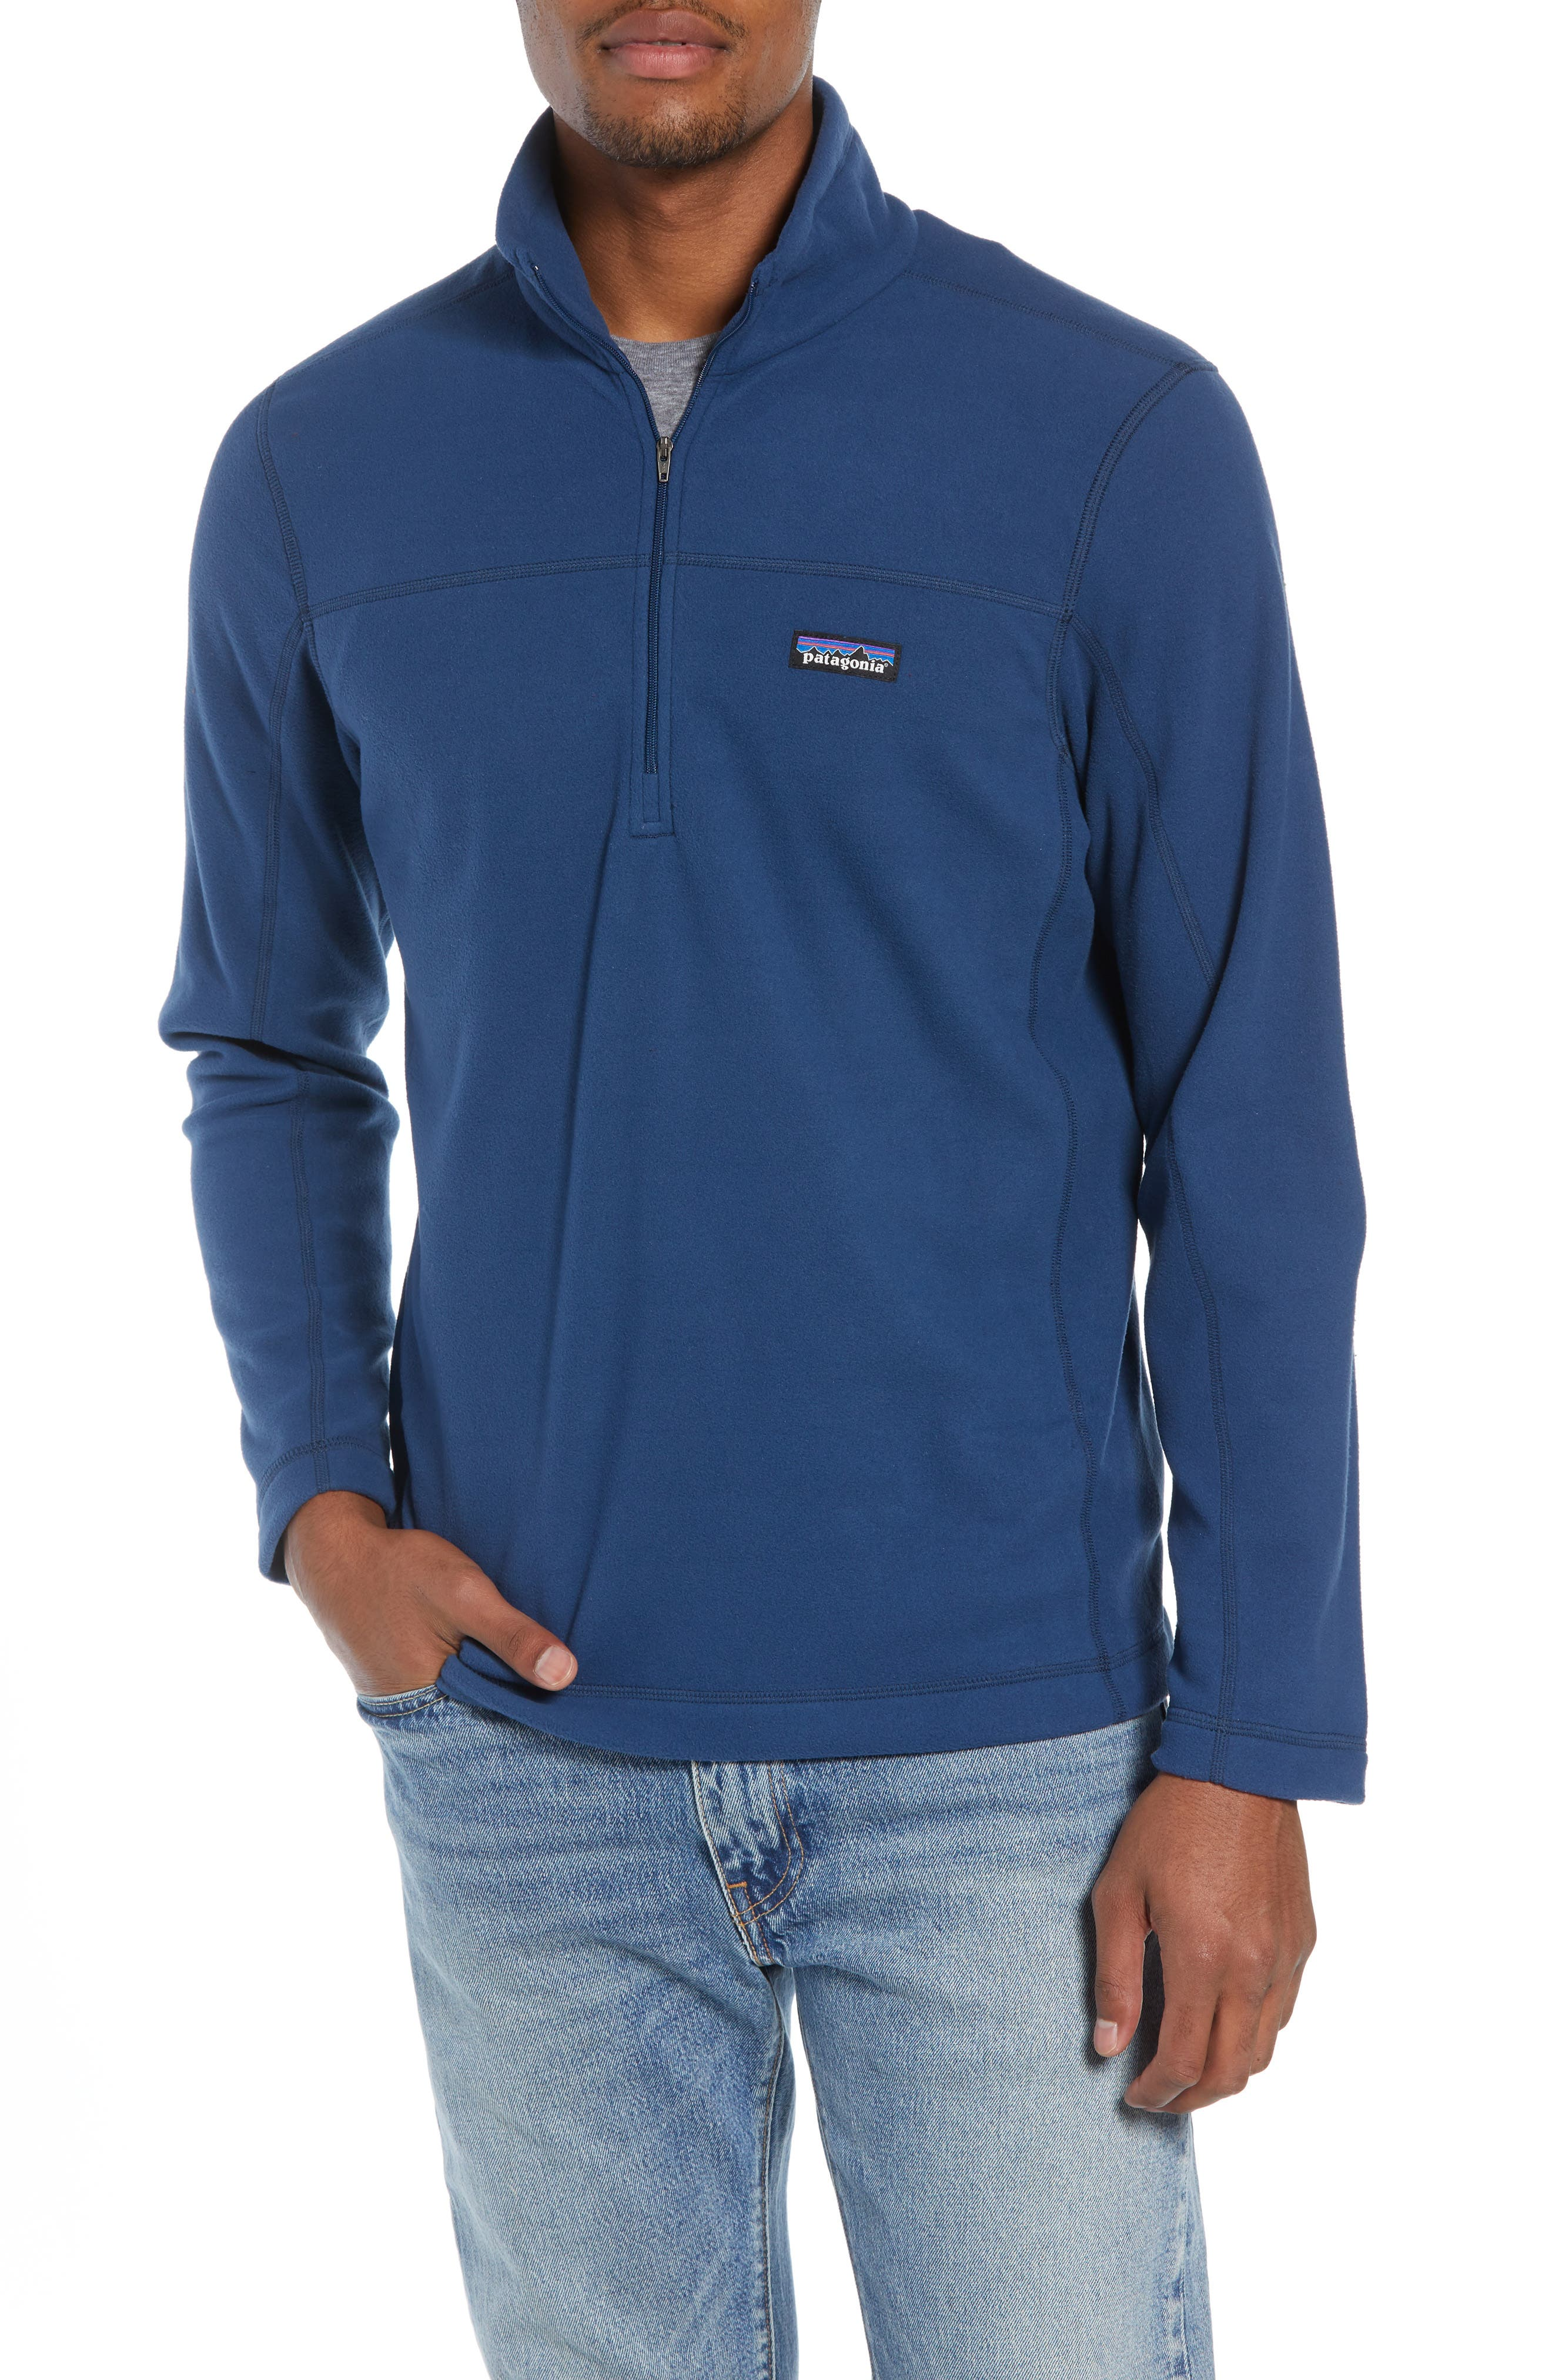 Fleece Pullover,                             Main thumbnail 1, color,                             STONE BLUE